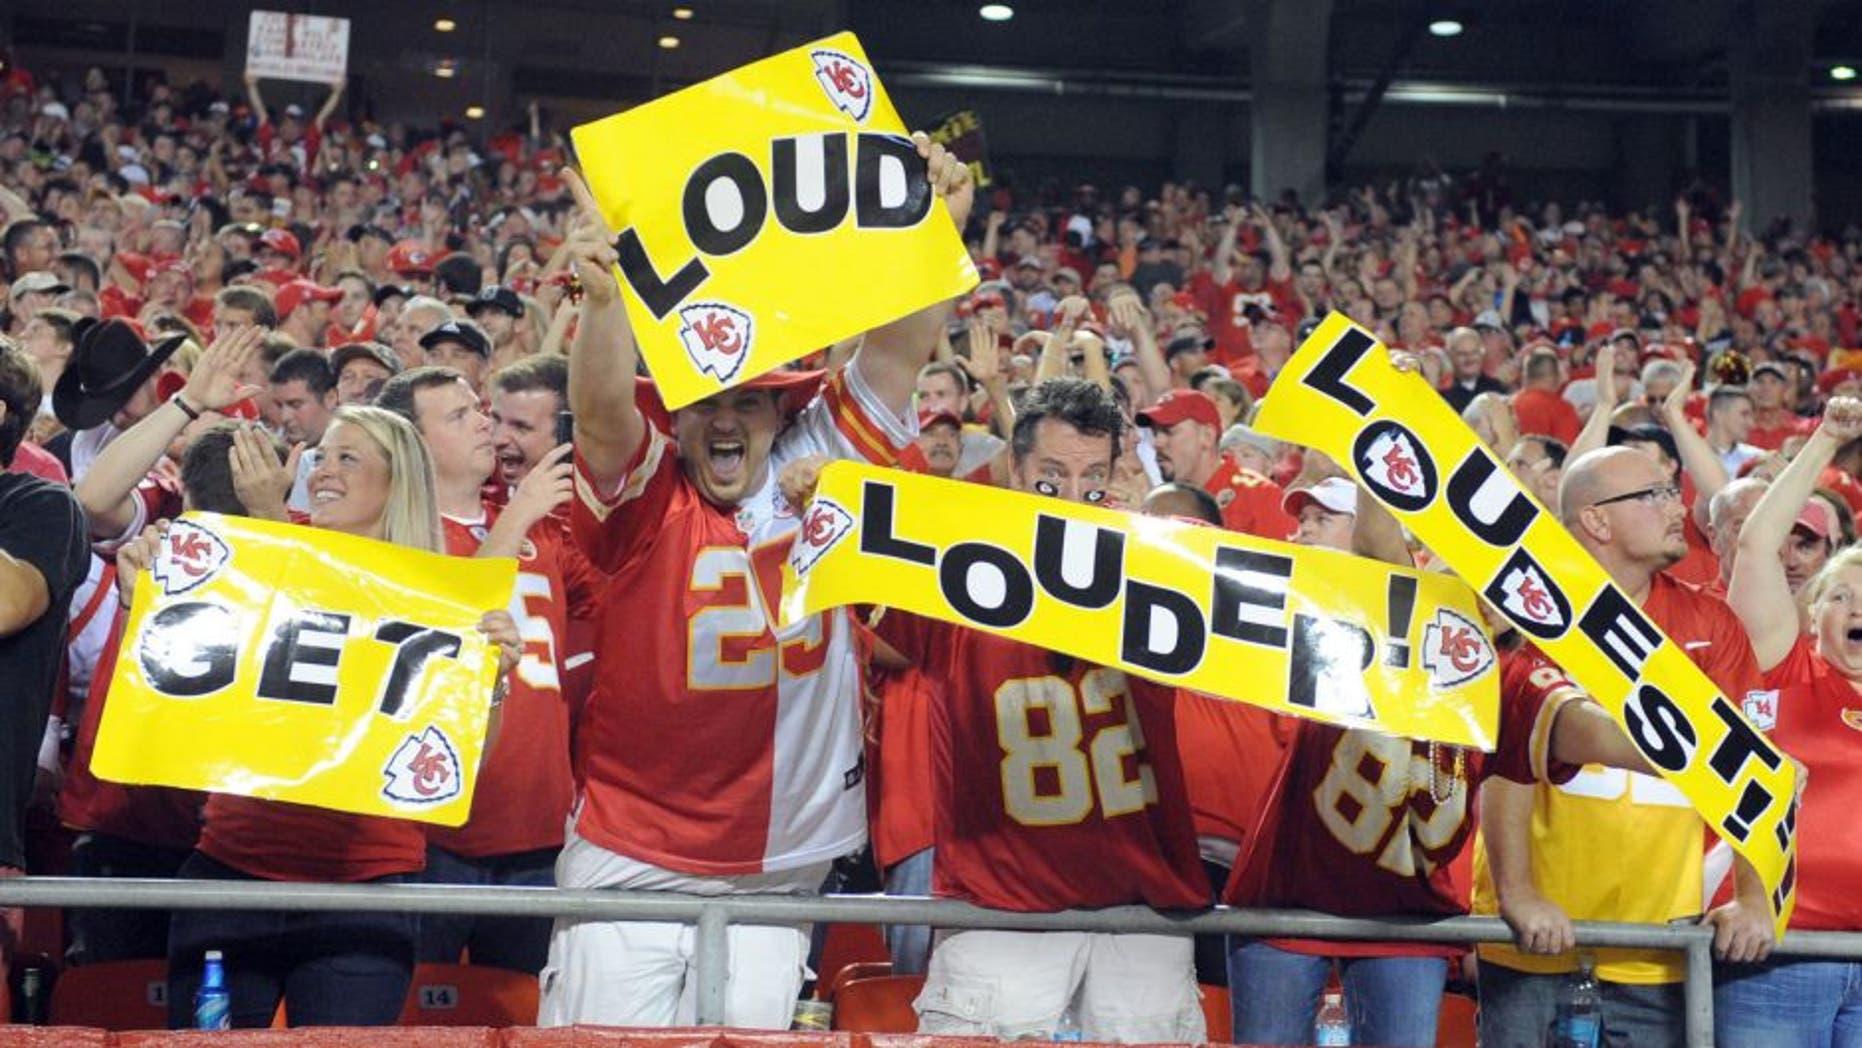 Sep 29, 2014; Kansas City, MO, USA; Kansas City Chiefs fans cheer in the first half against the New England Patriots at Arrowhead Stadium. Kansas City won 41-14. Mandatory Credit: John Rieger-USA TODAY Sports